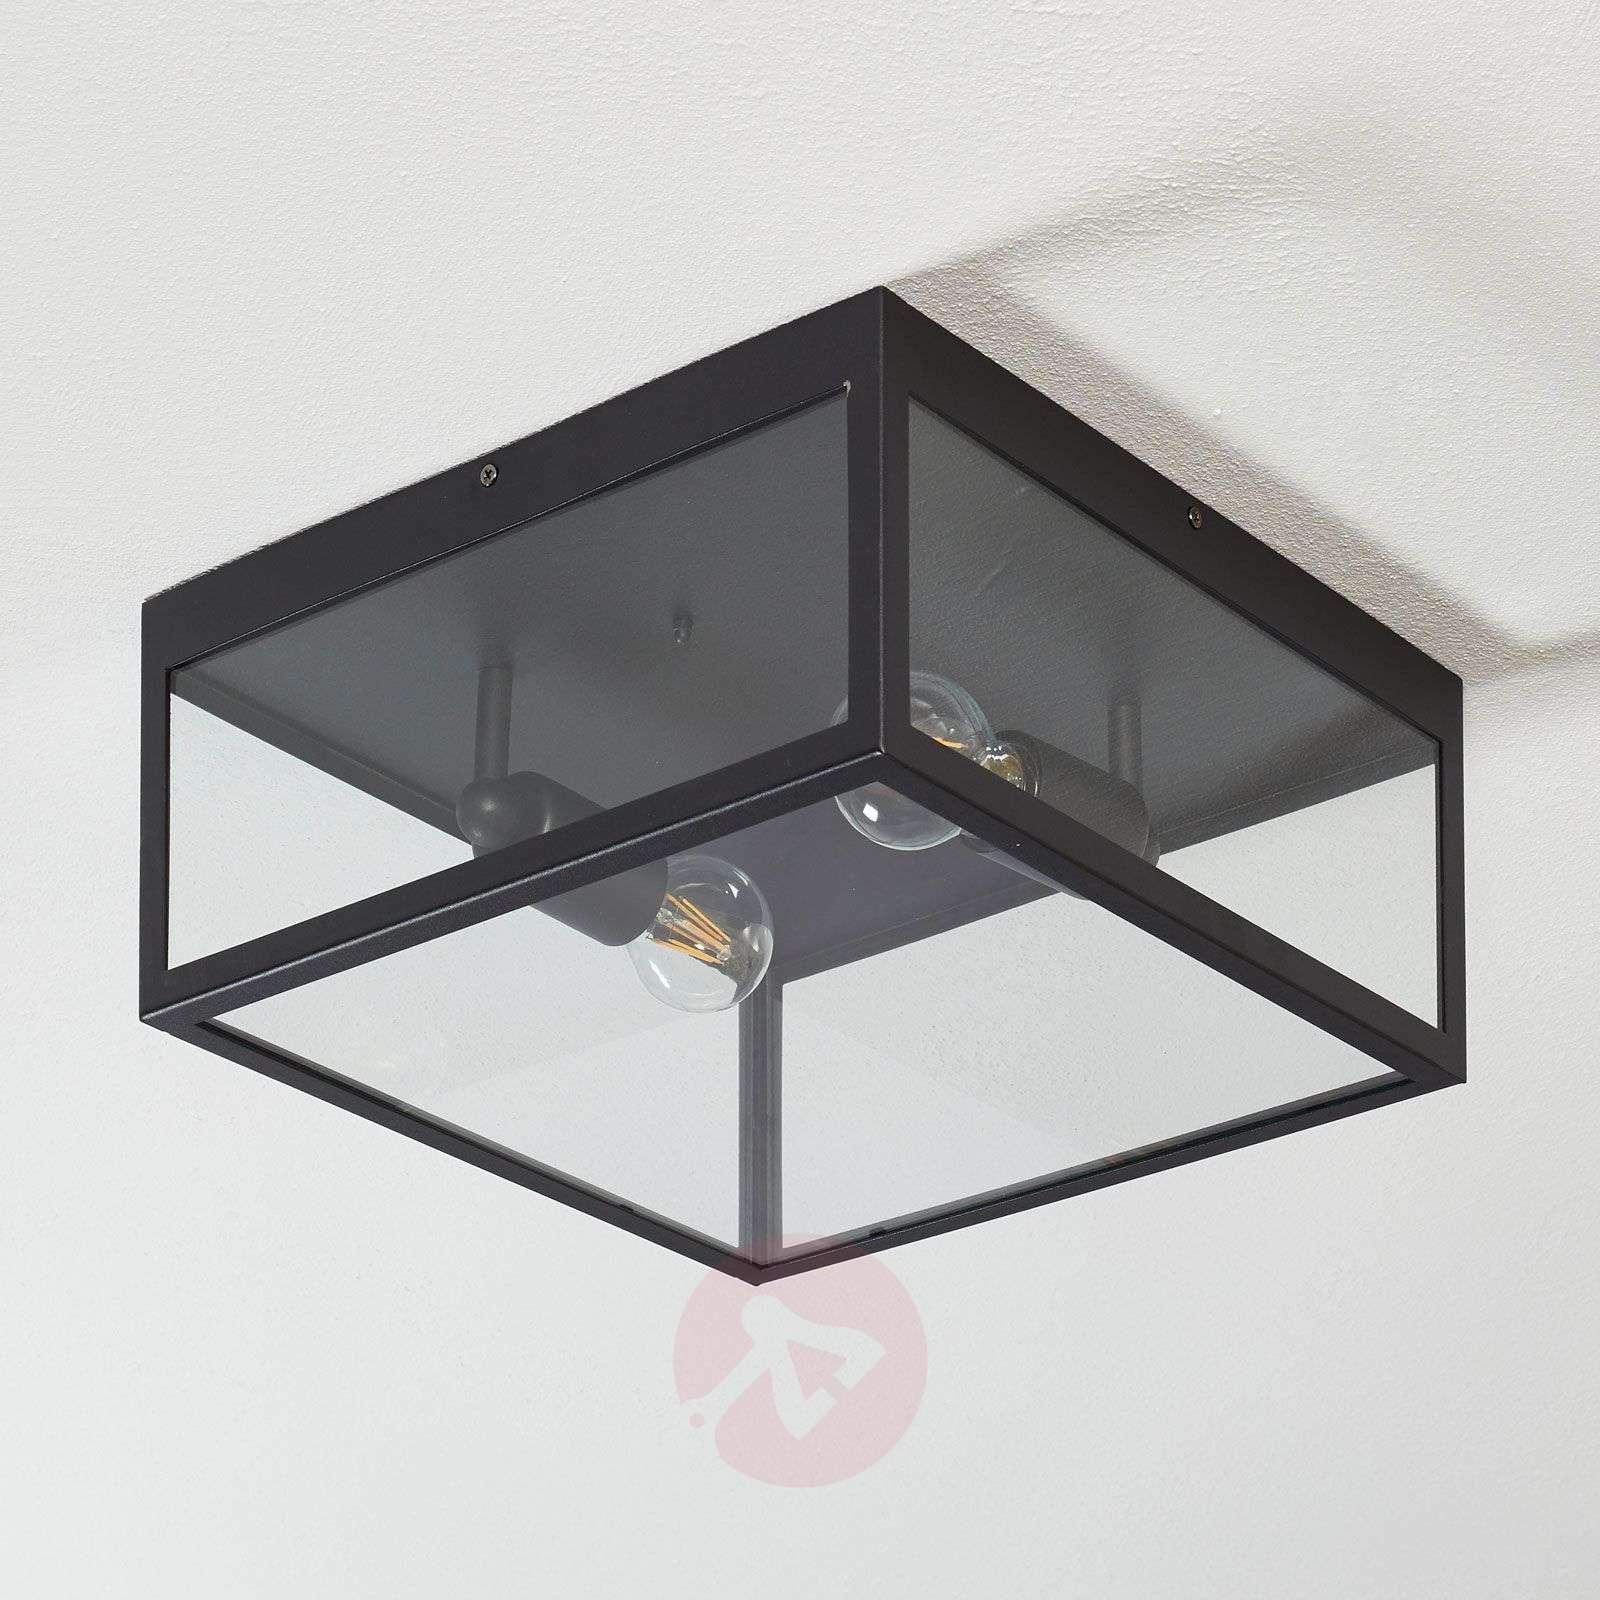 Angular Charterhouse vintage ceiling light-3031782-01